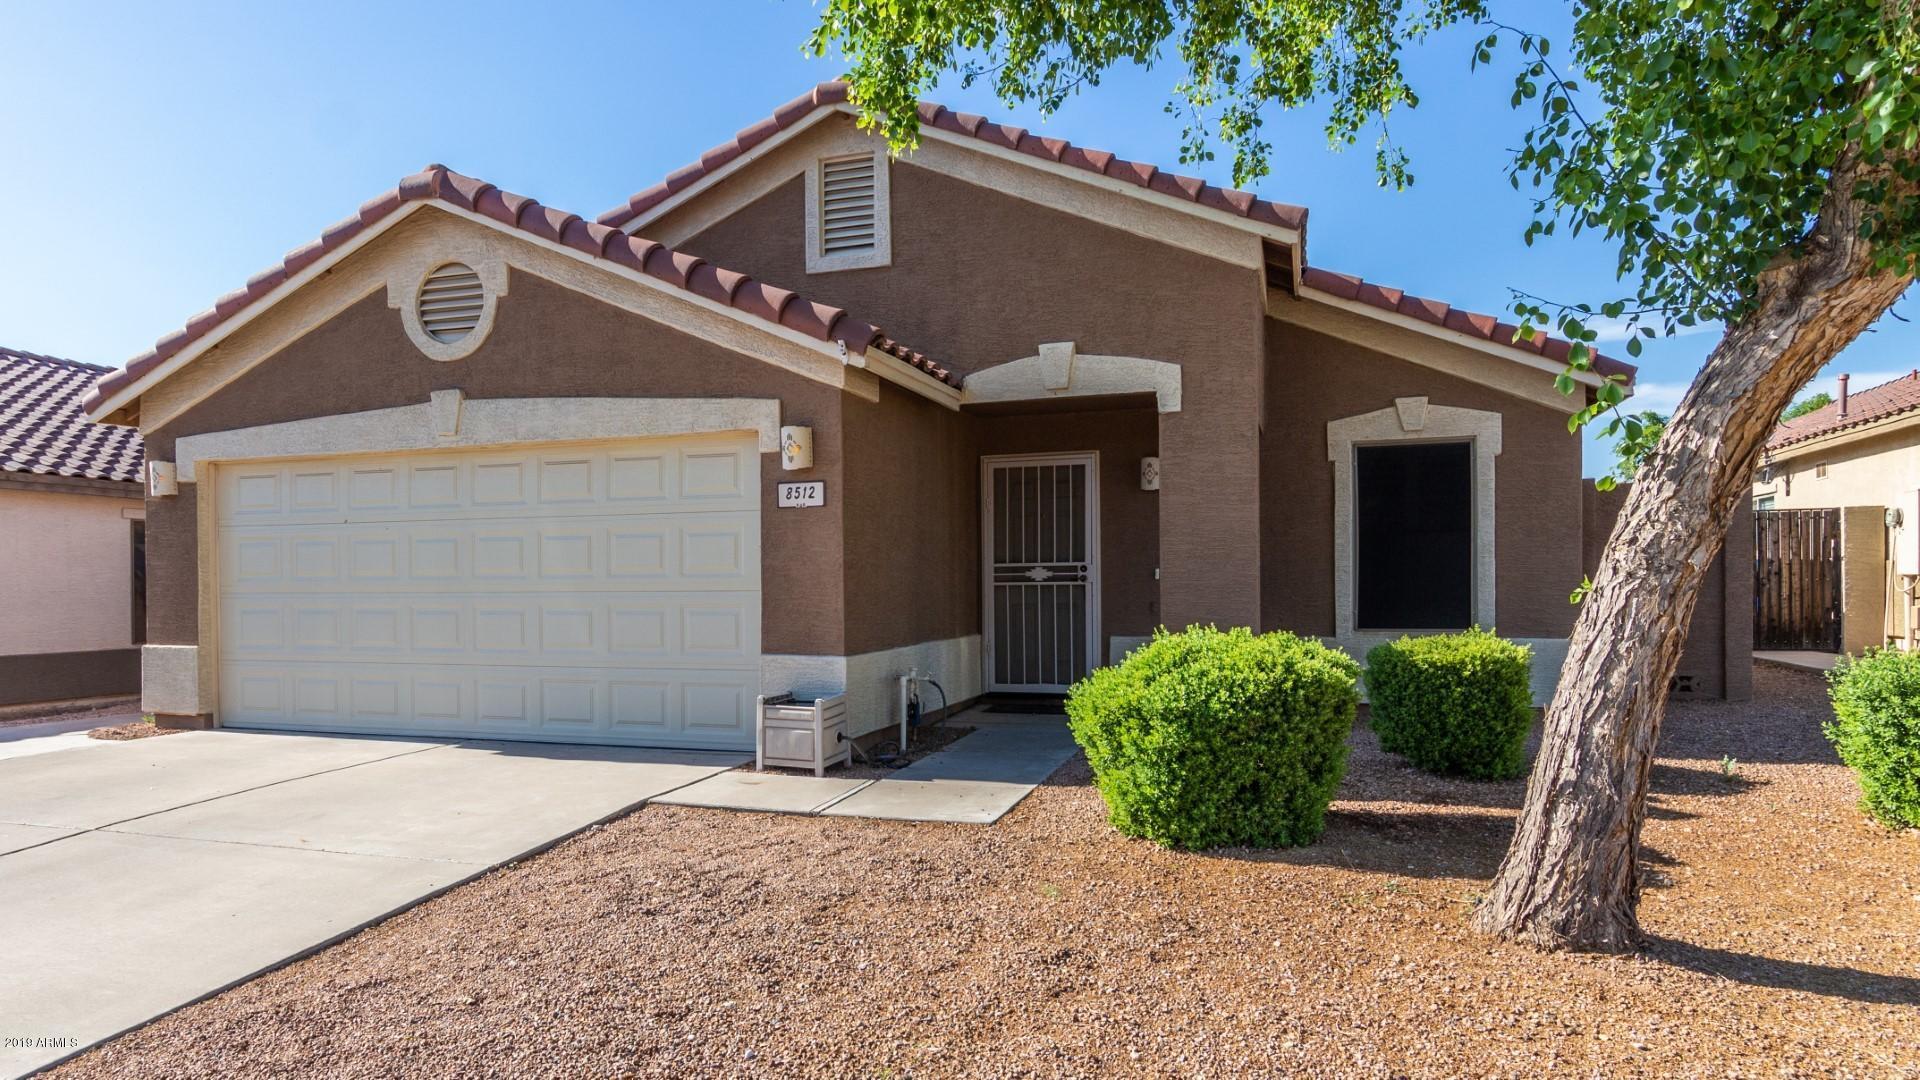 Photo of 8512 E MESETO Avenue, Mesa, AZ 85209